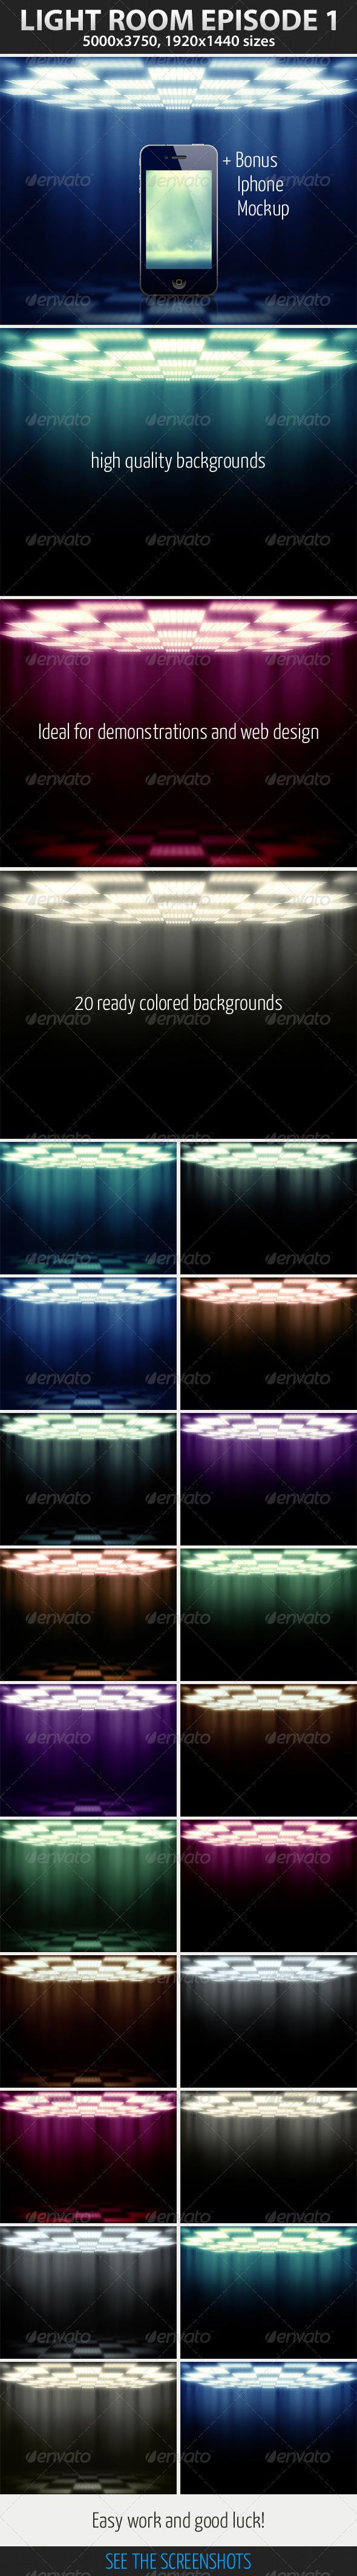 Light Room Episode 1 - Backgrounds Graphics